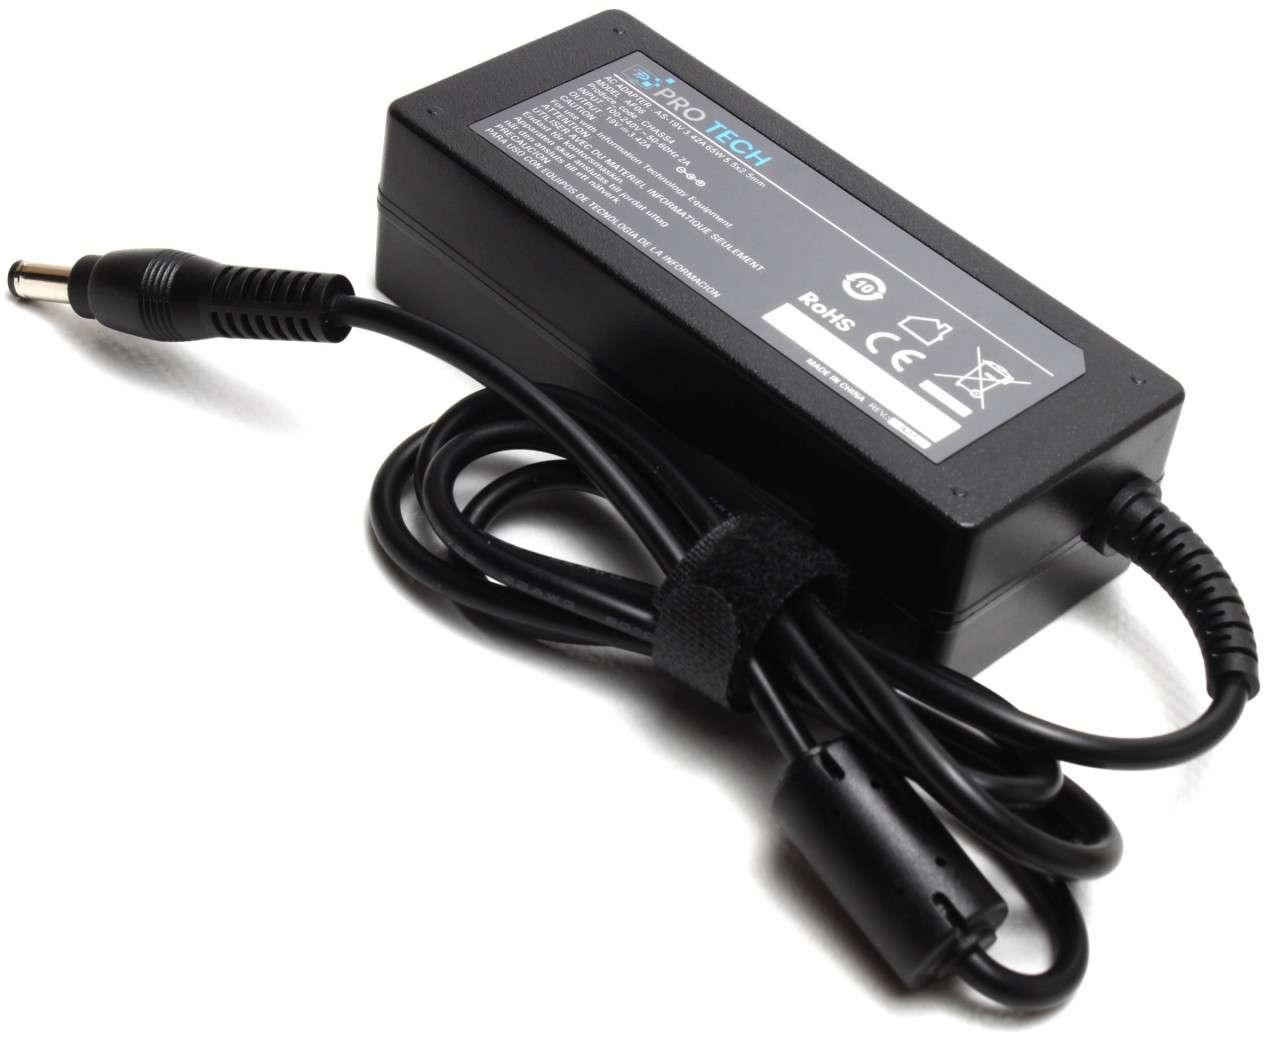 Incarcator Packard Bell Ajax C3 Replacement imagine powerlaptop.ro 2021